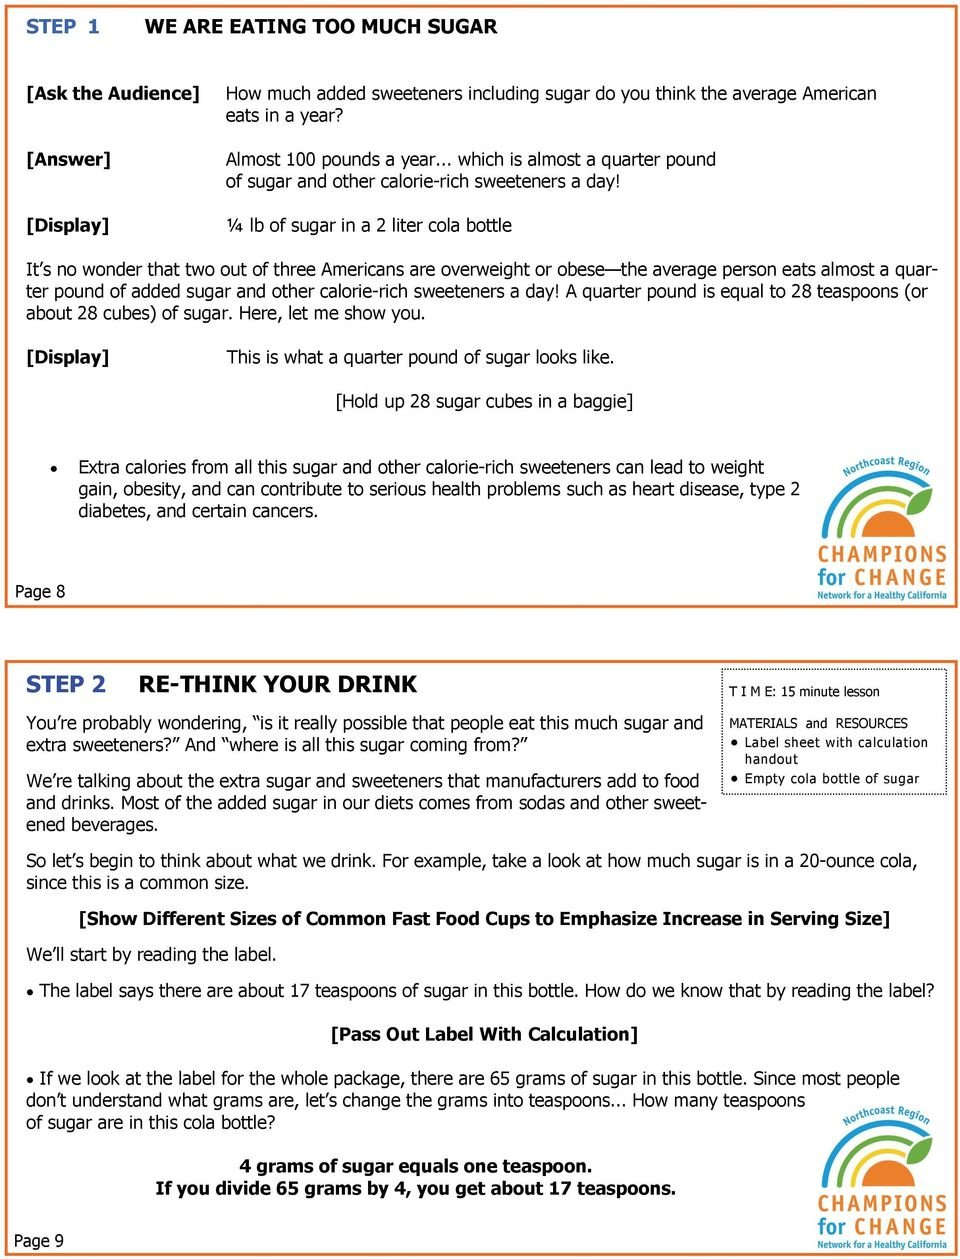 Nutrition Label Worksheet Nscsd Answers  Trovoadasonhos Intended For Reading Nutrition Labels Worksheet